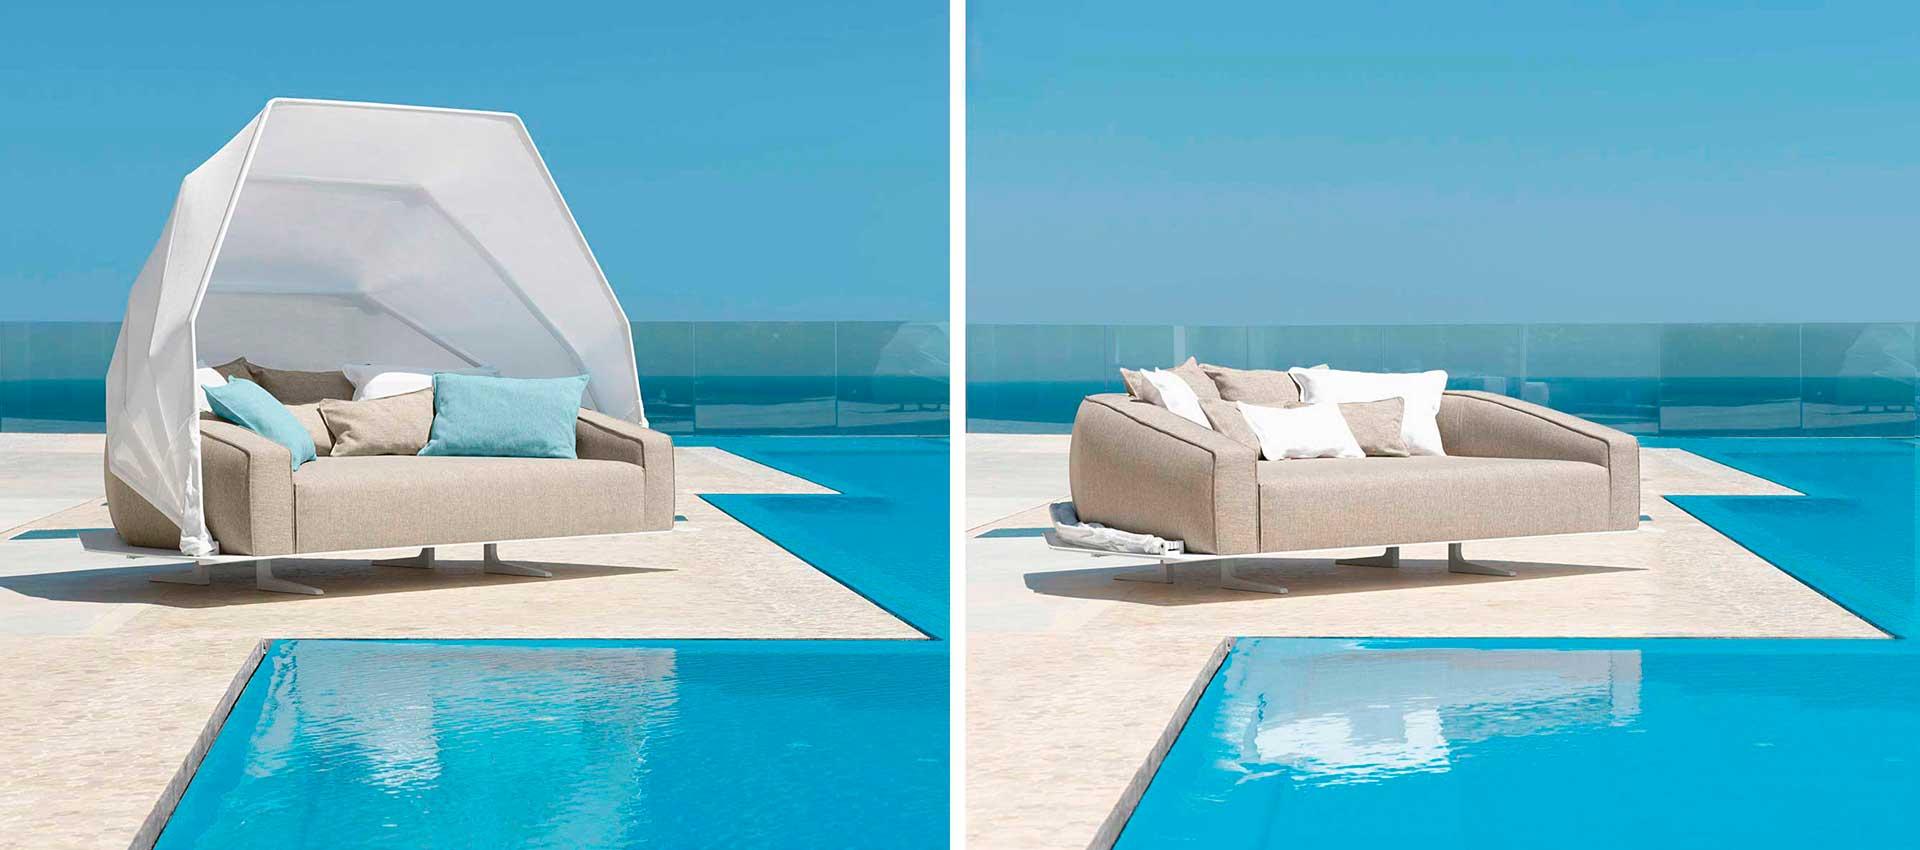 Outdoor Sofas - Sunbeds - Umbrellas